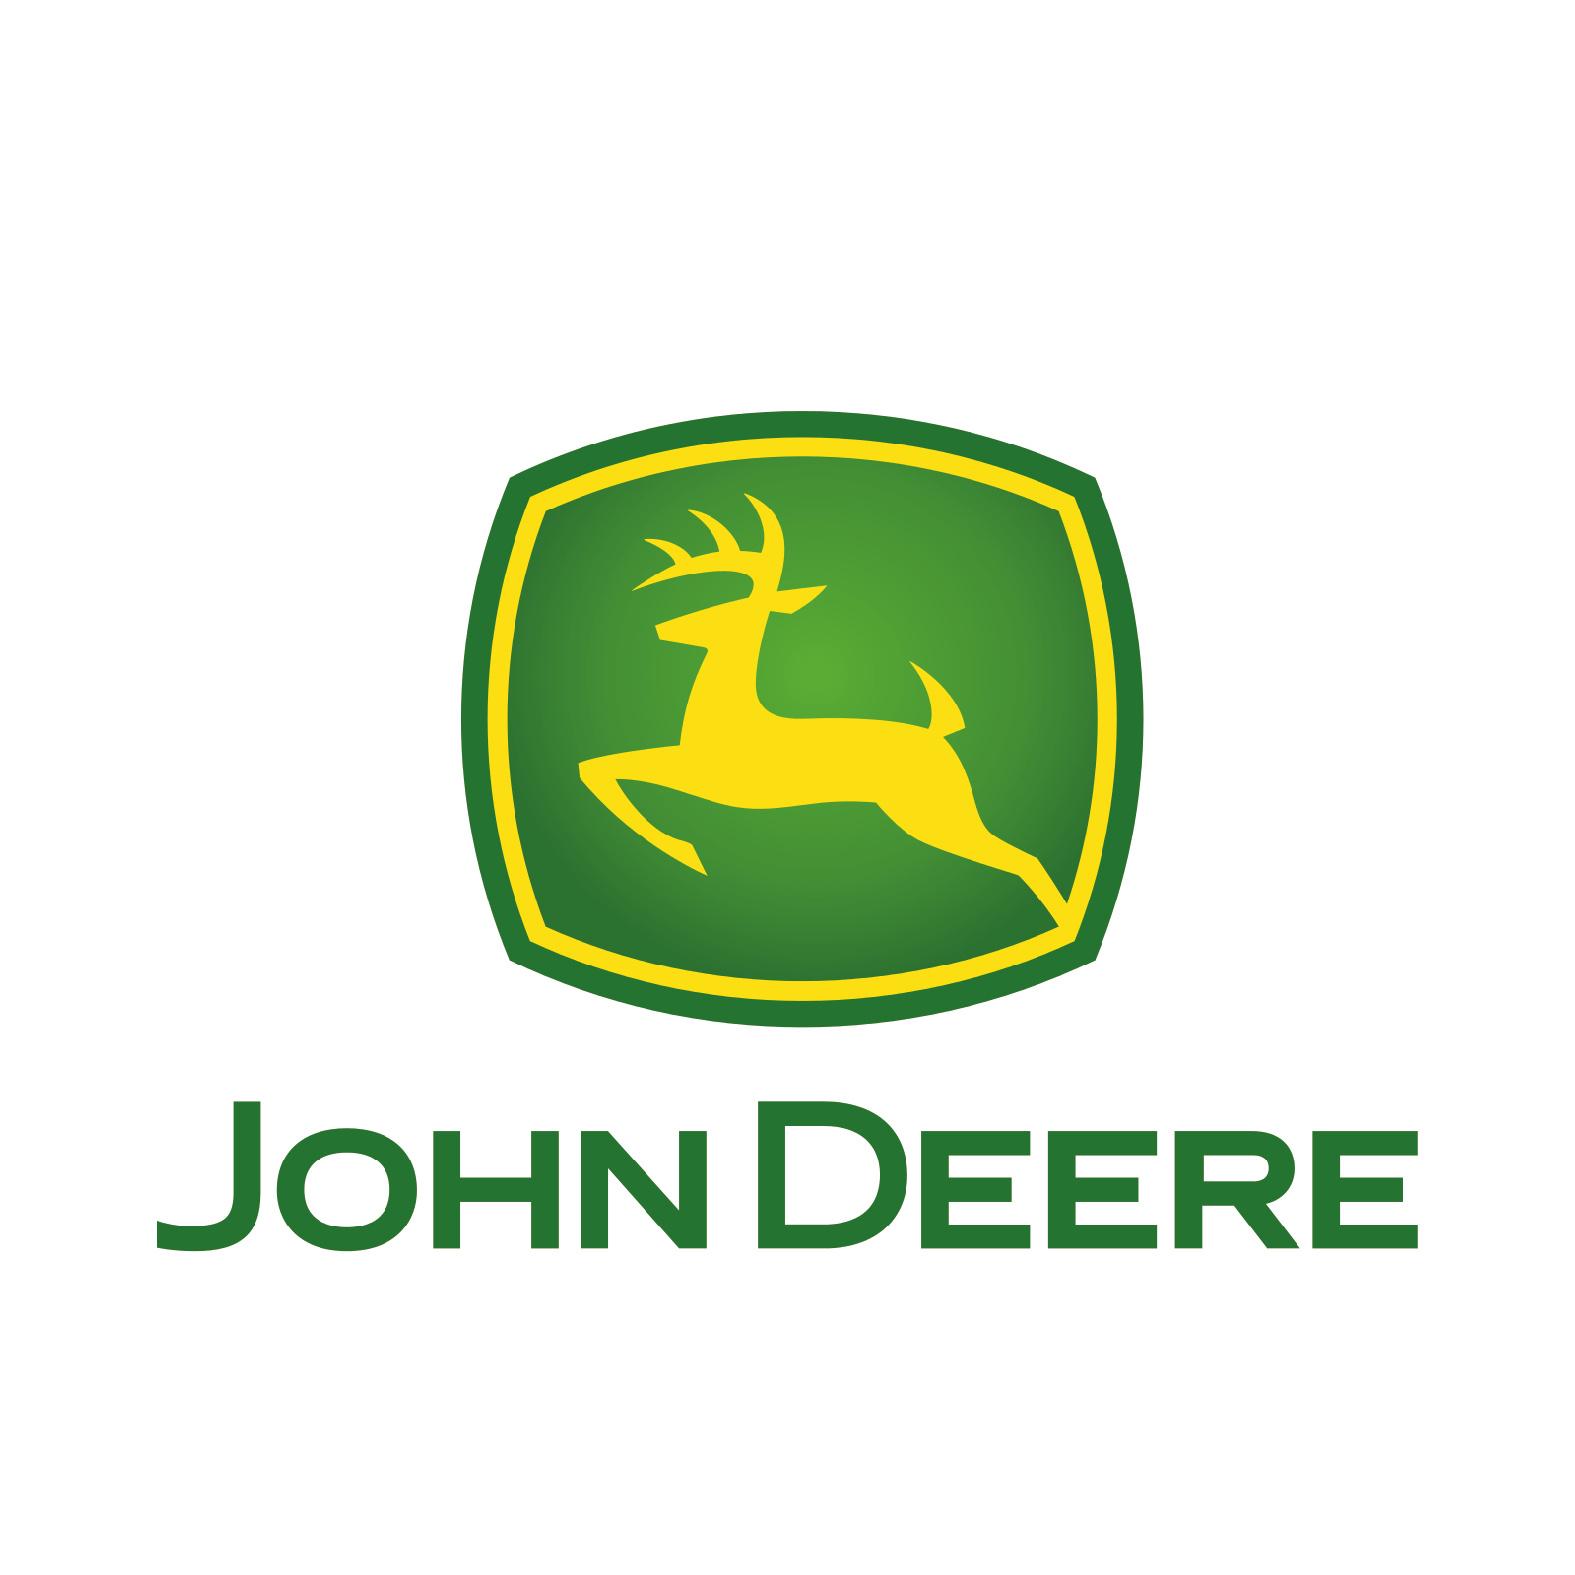 john deere-01